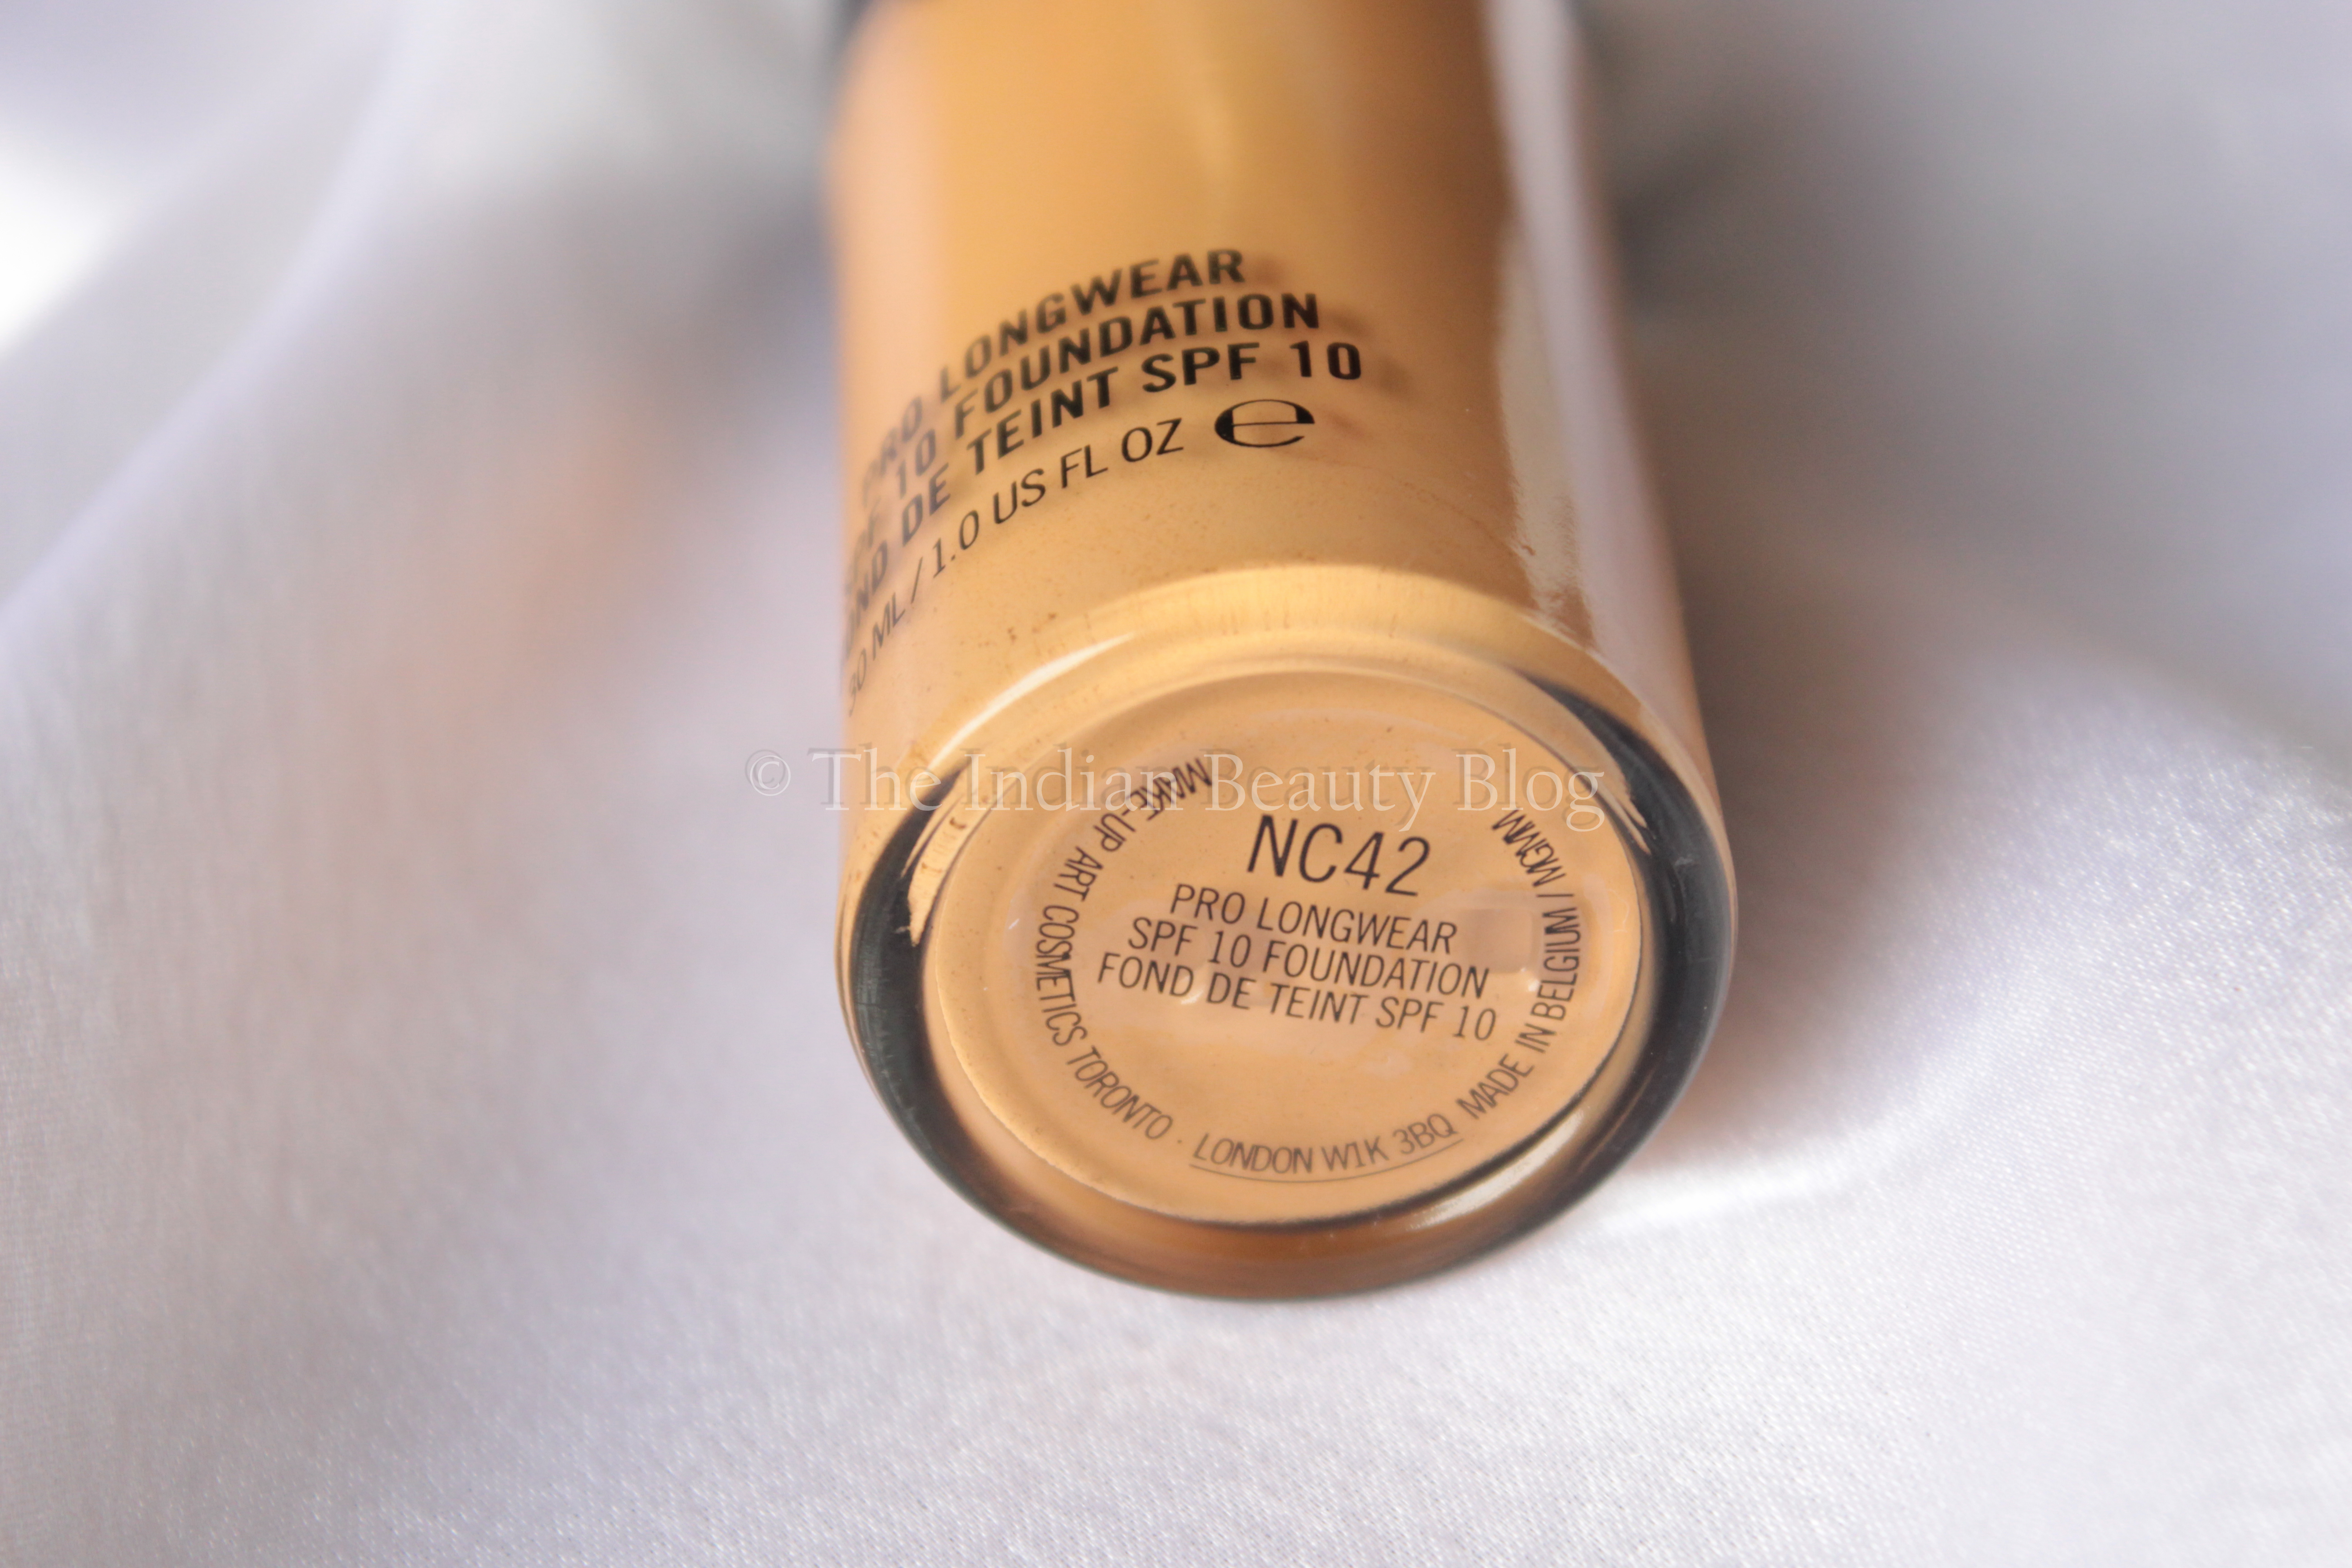 Mac Pro Longwear Foundation Nc42 Review The Indian Beauty Blog